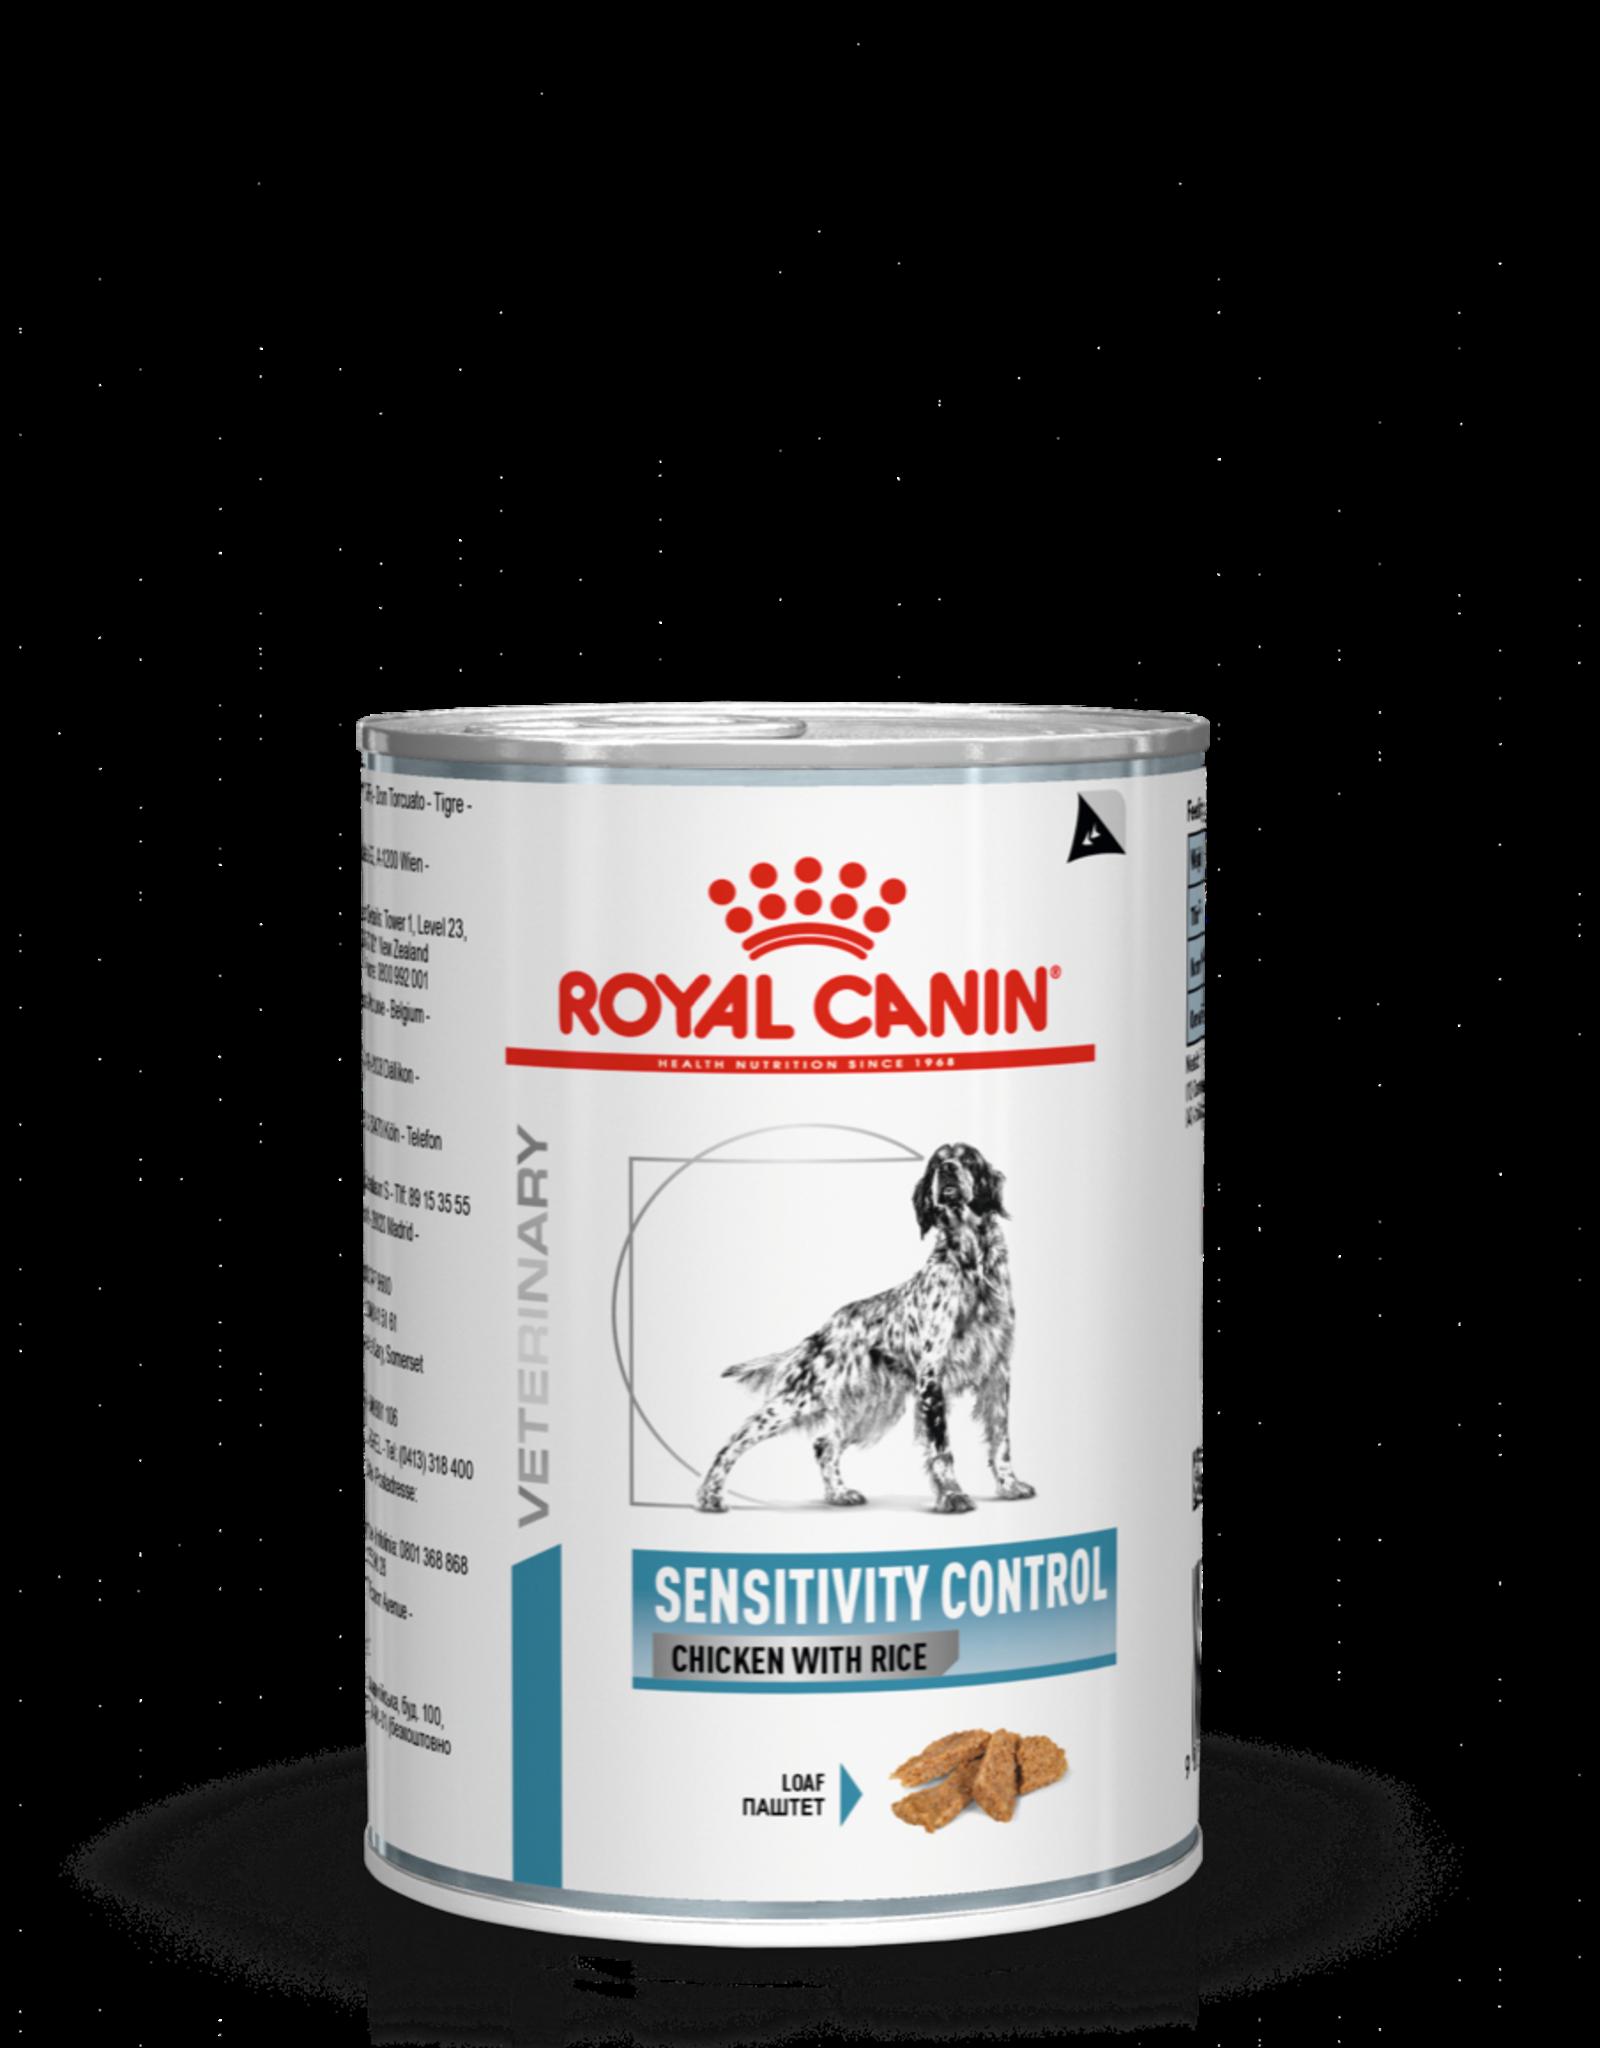 Royal Canin Royal Canin Sensitivity Control Hond Kip 12x420gr